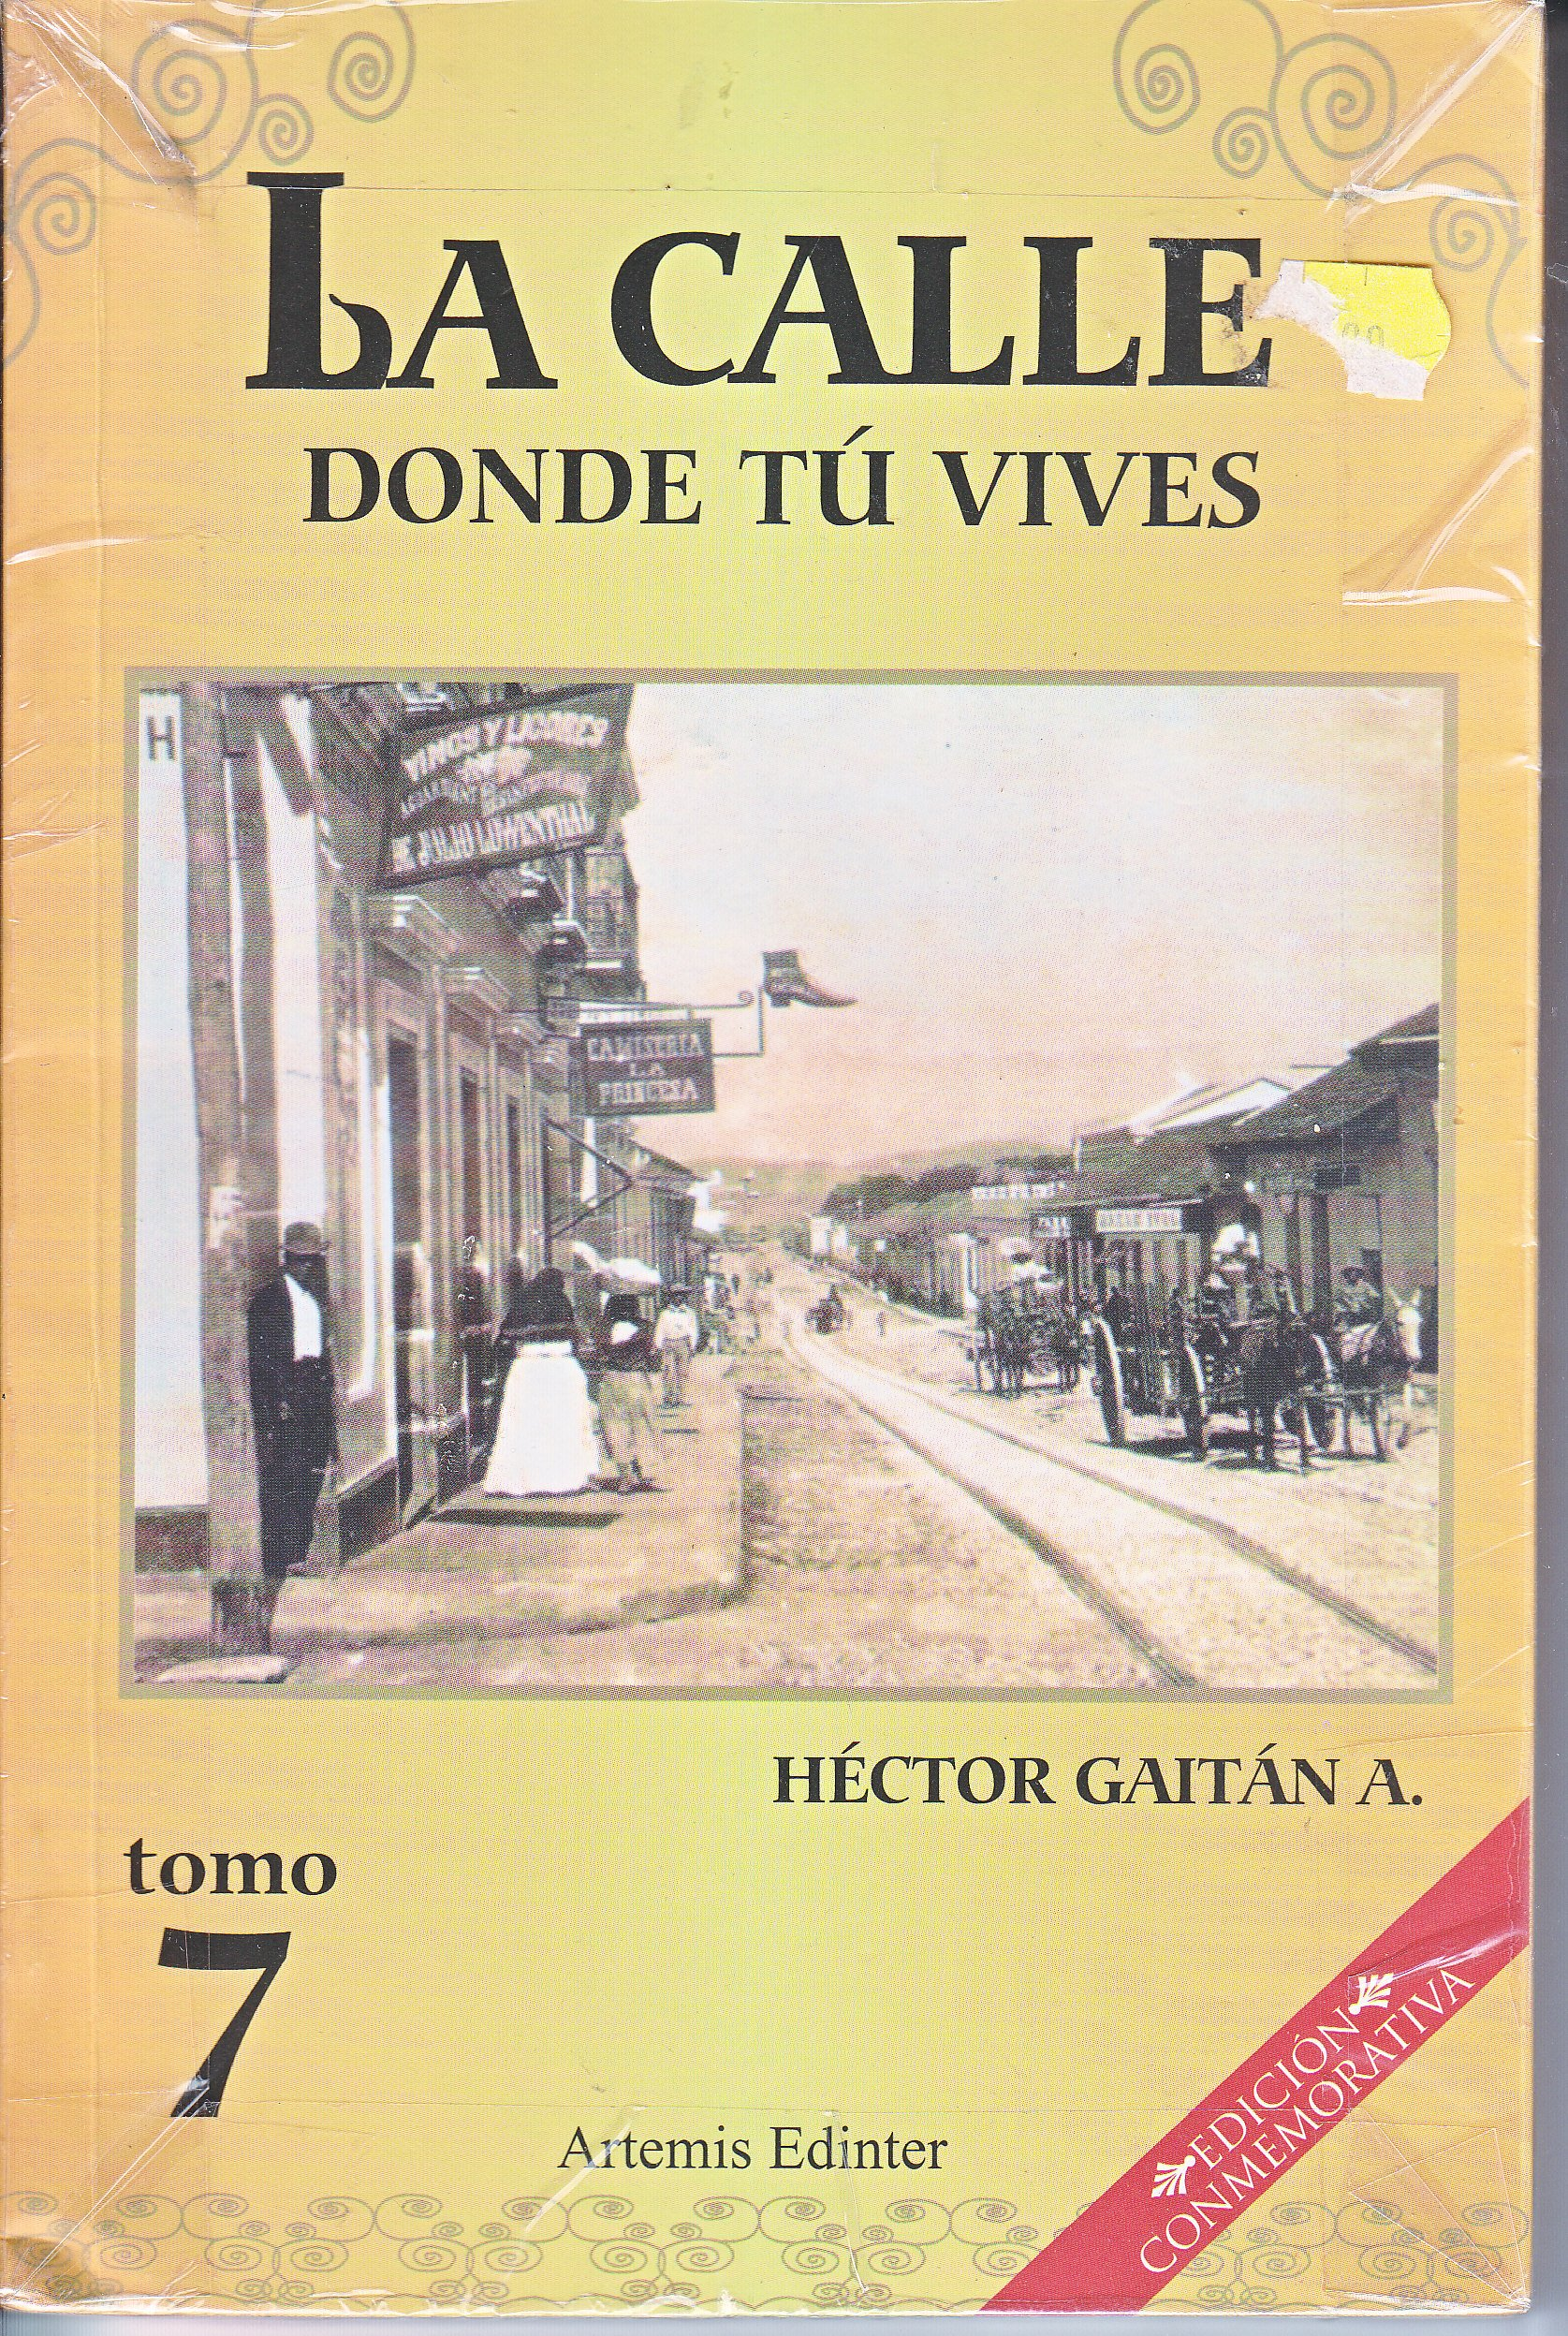 Download La calle donde tu vives/ The street where you live (Poesía) (Spanish Edition) pdf epub